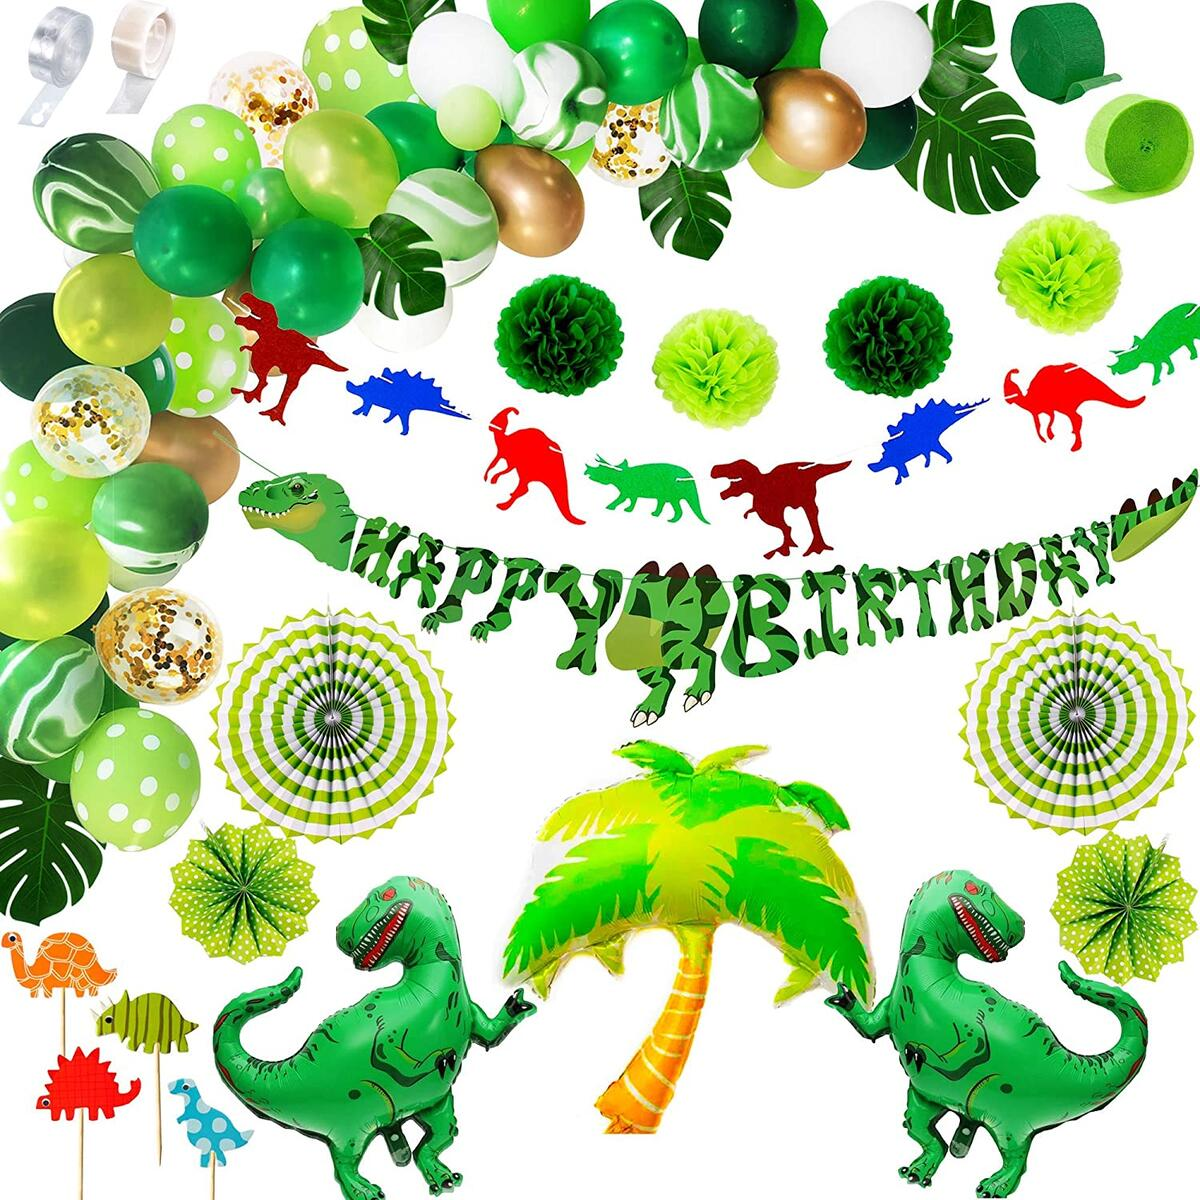 125 Pcs Dinosaur Birthday Party Supplies   Premium Mega Decorations Set Boys Girls   Balloon Arch Garland Kit, Happy Banner, TRex Palm Tree Inflatable Balloons   Dino Jungle Animal Jurassic Theme